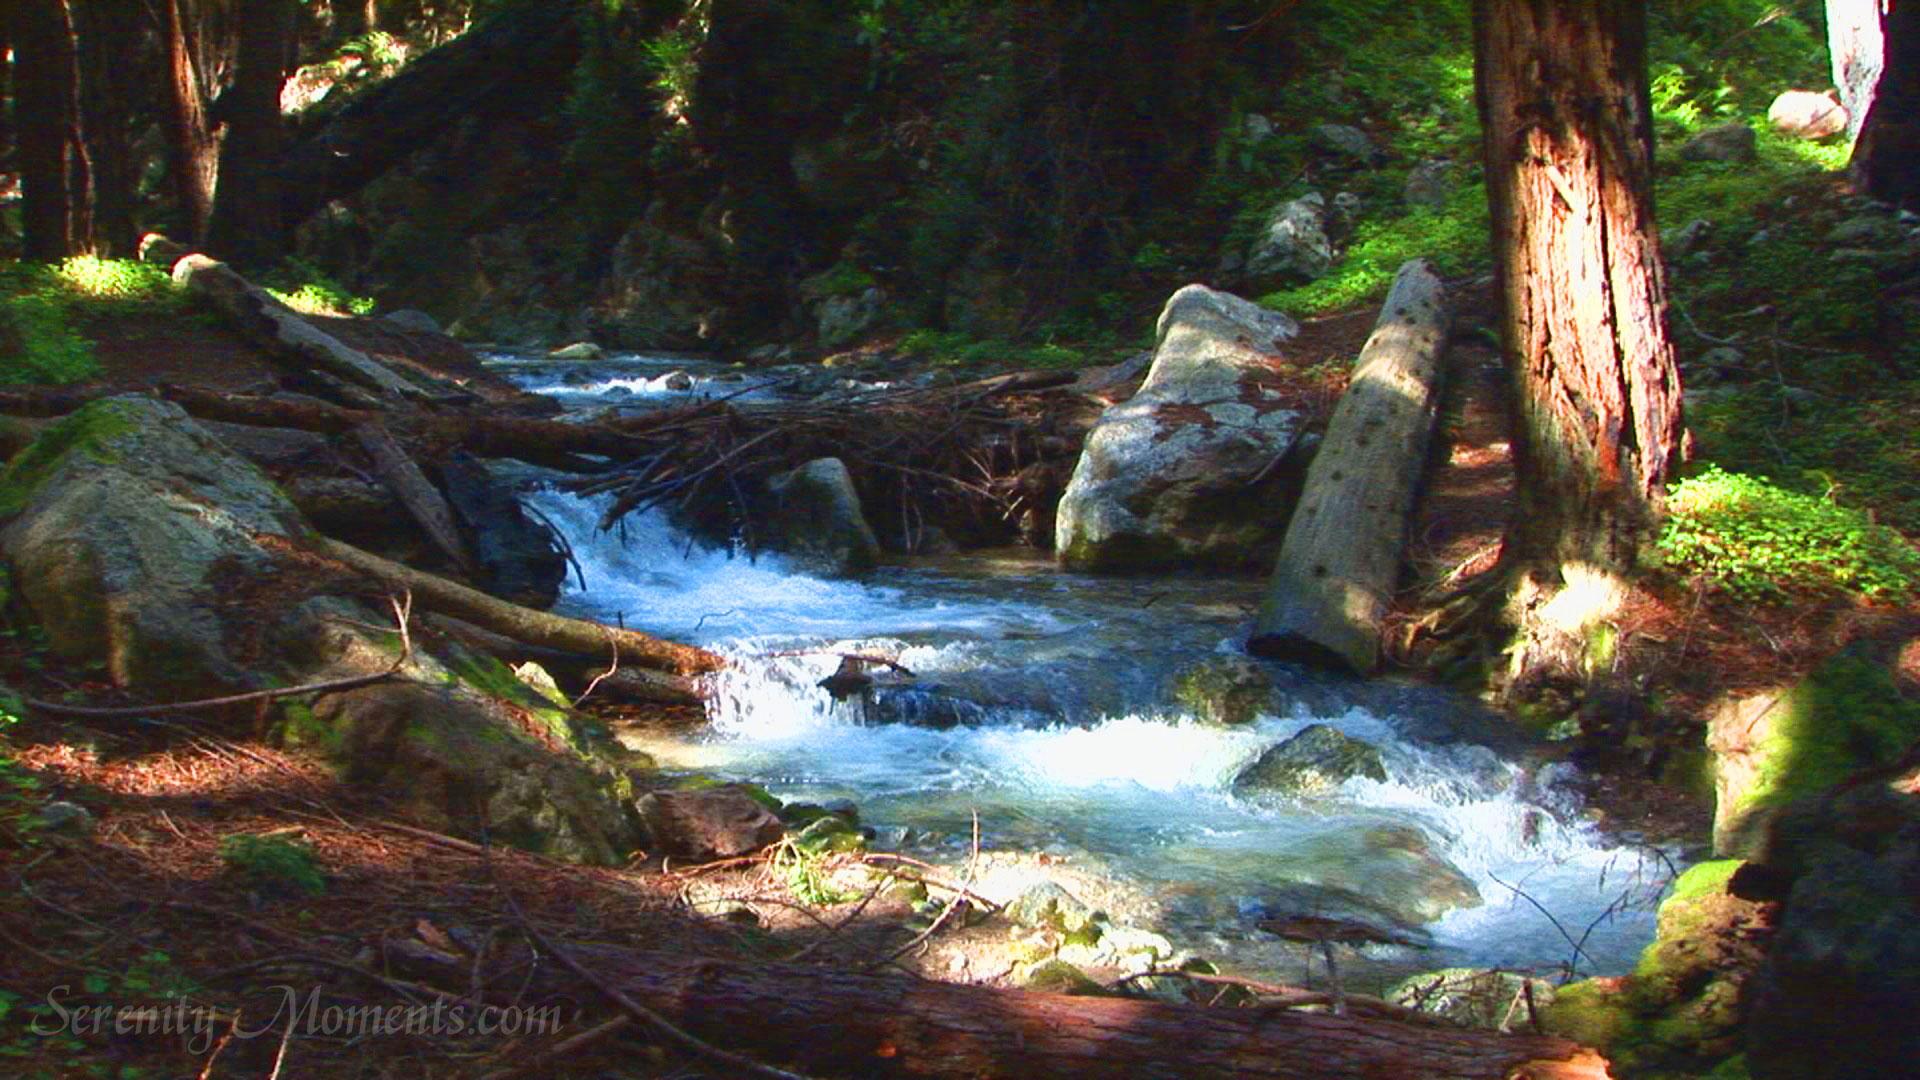 Eastern Territory: Clear Water Creak  Big_sur_forest_lime_kiln_creek